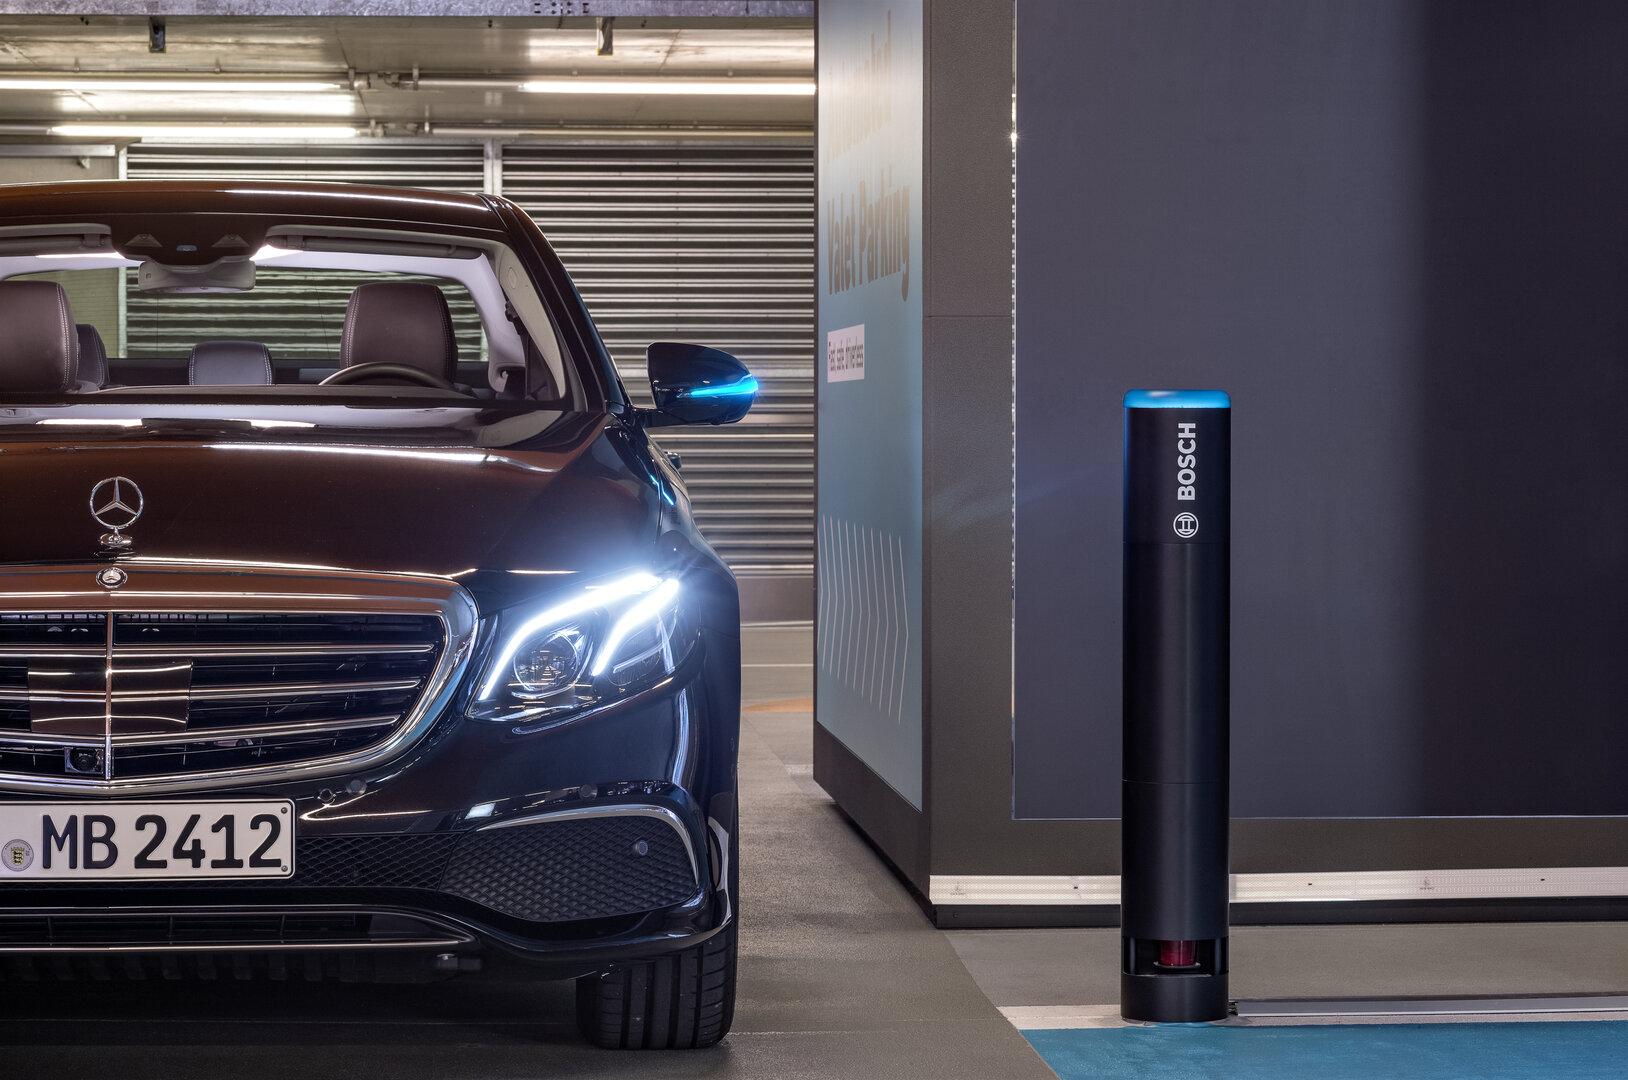 Automated Valet Parking im Mercedes-Benz Museum in Stuttgart